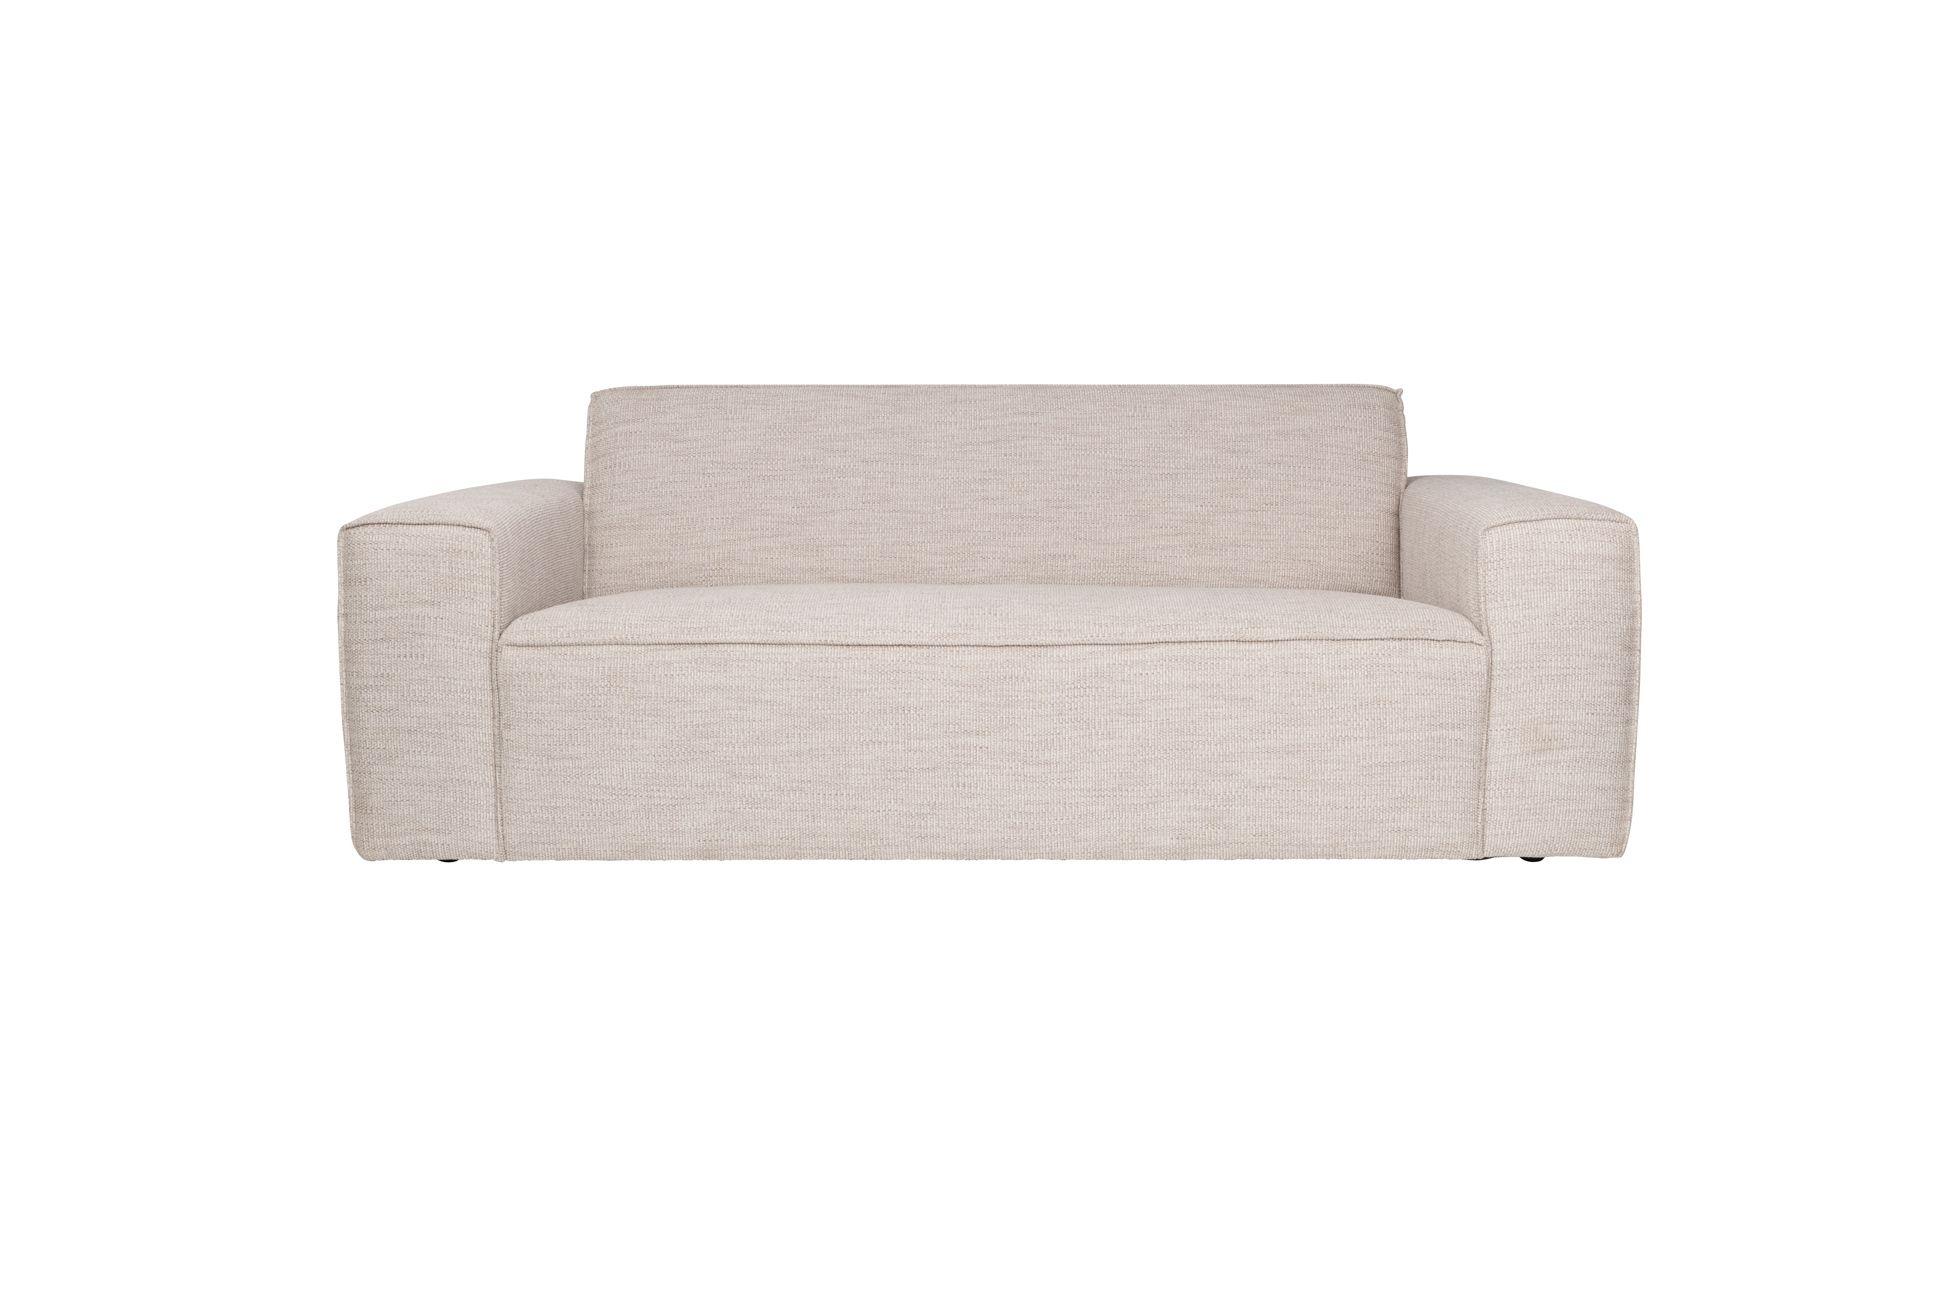 Bor Sofa 2 5 Seater Bank Kopen Bank Minimalistisch Design